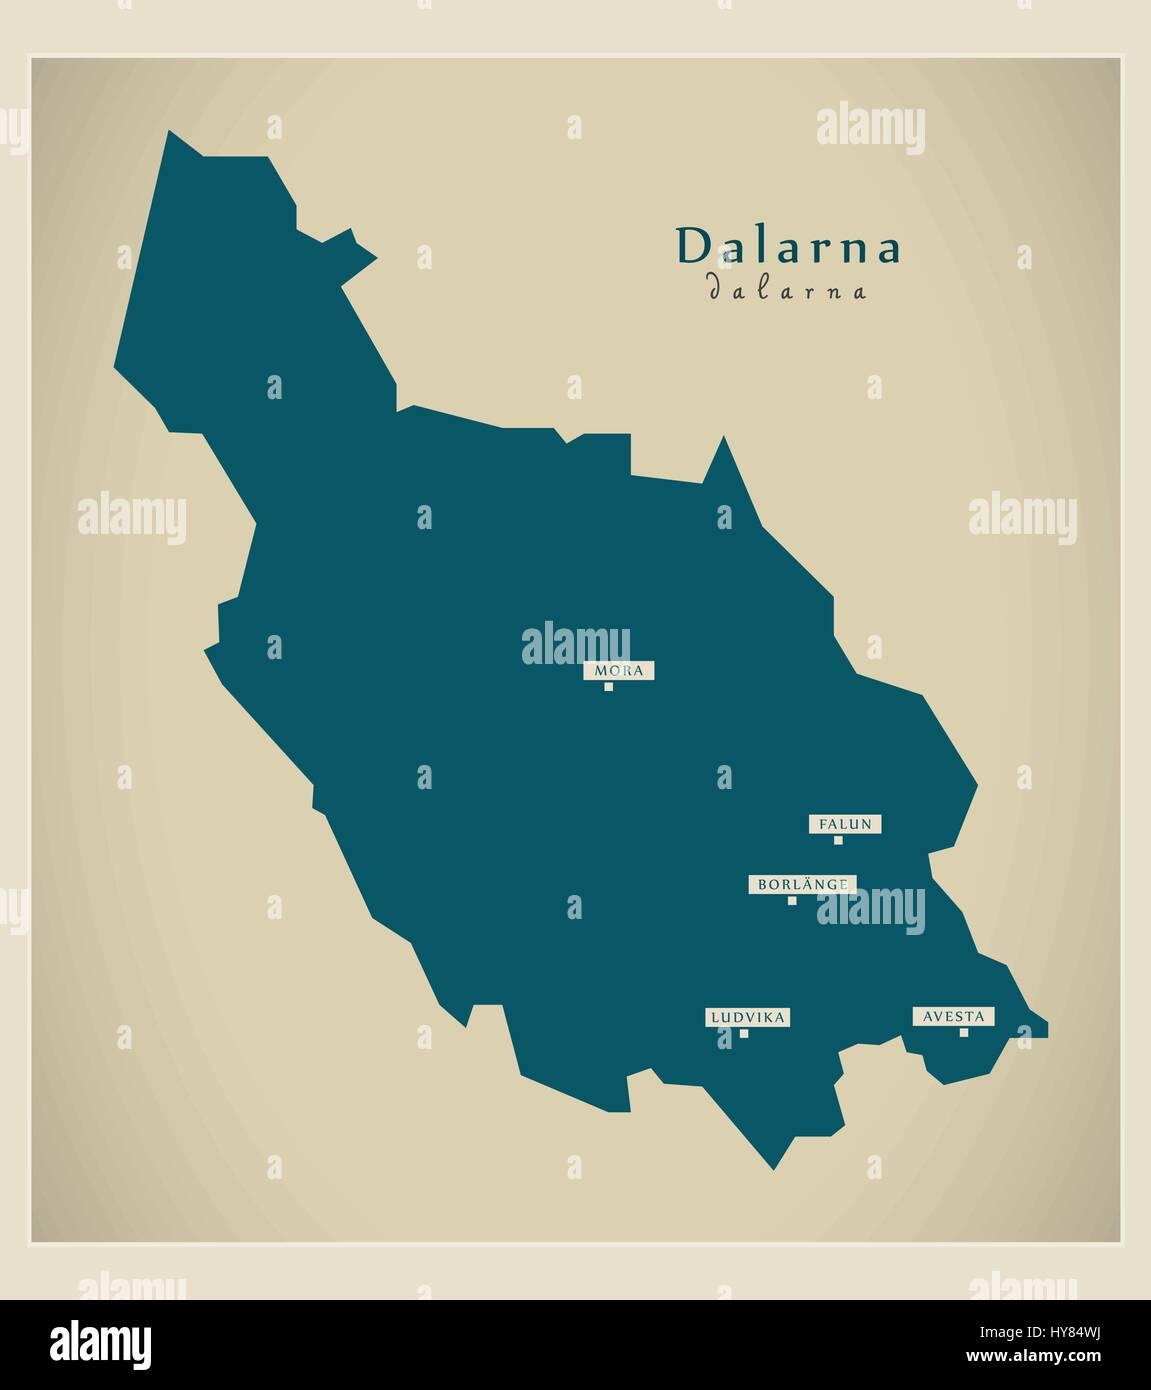 Modern Map - Dalarna SE - Stock Image